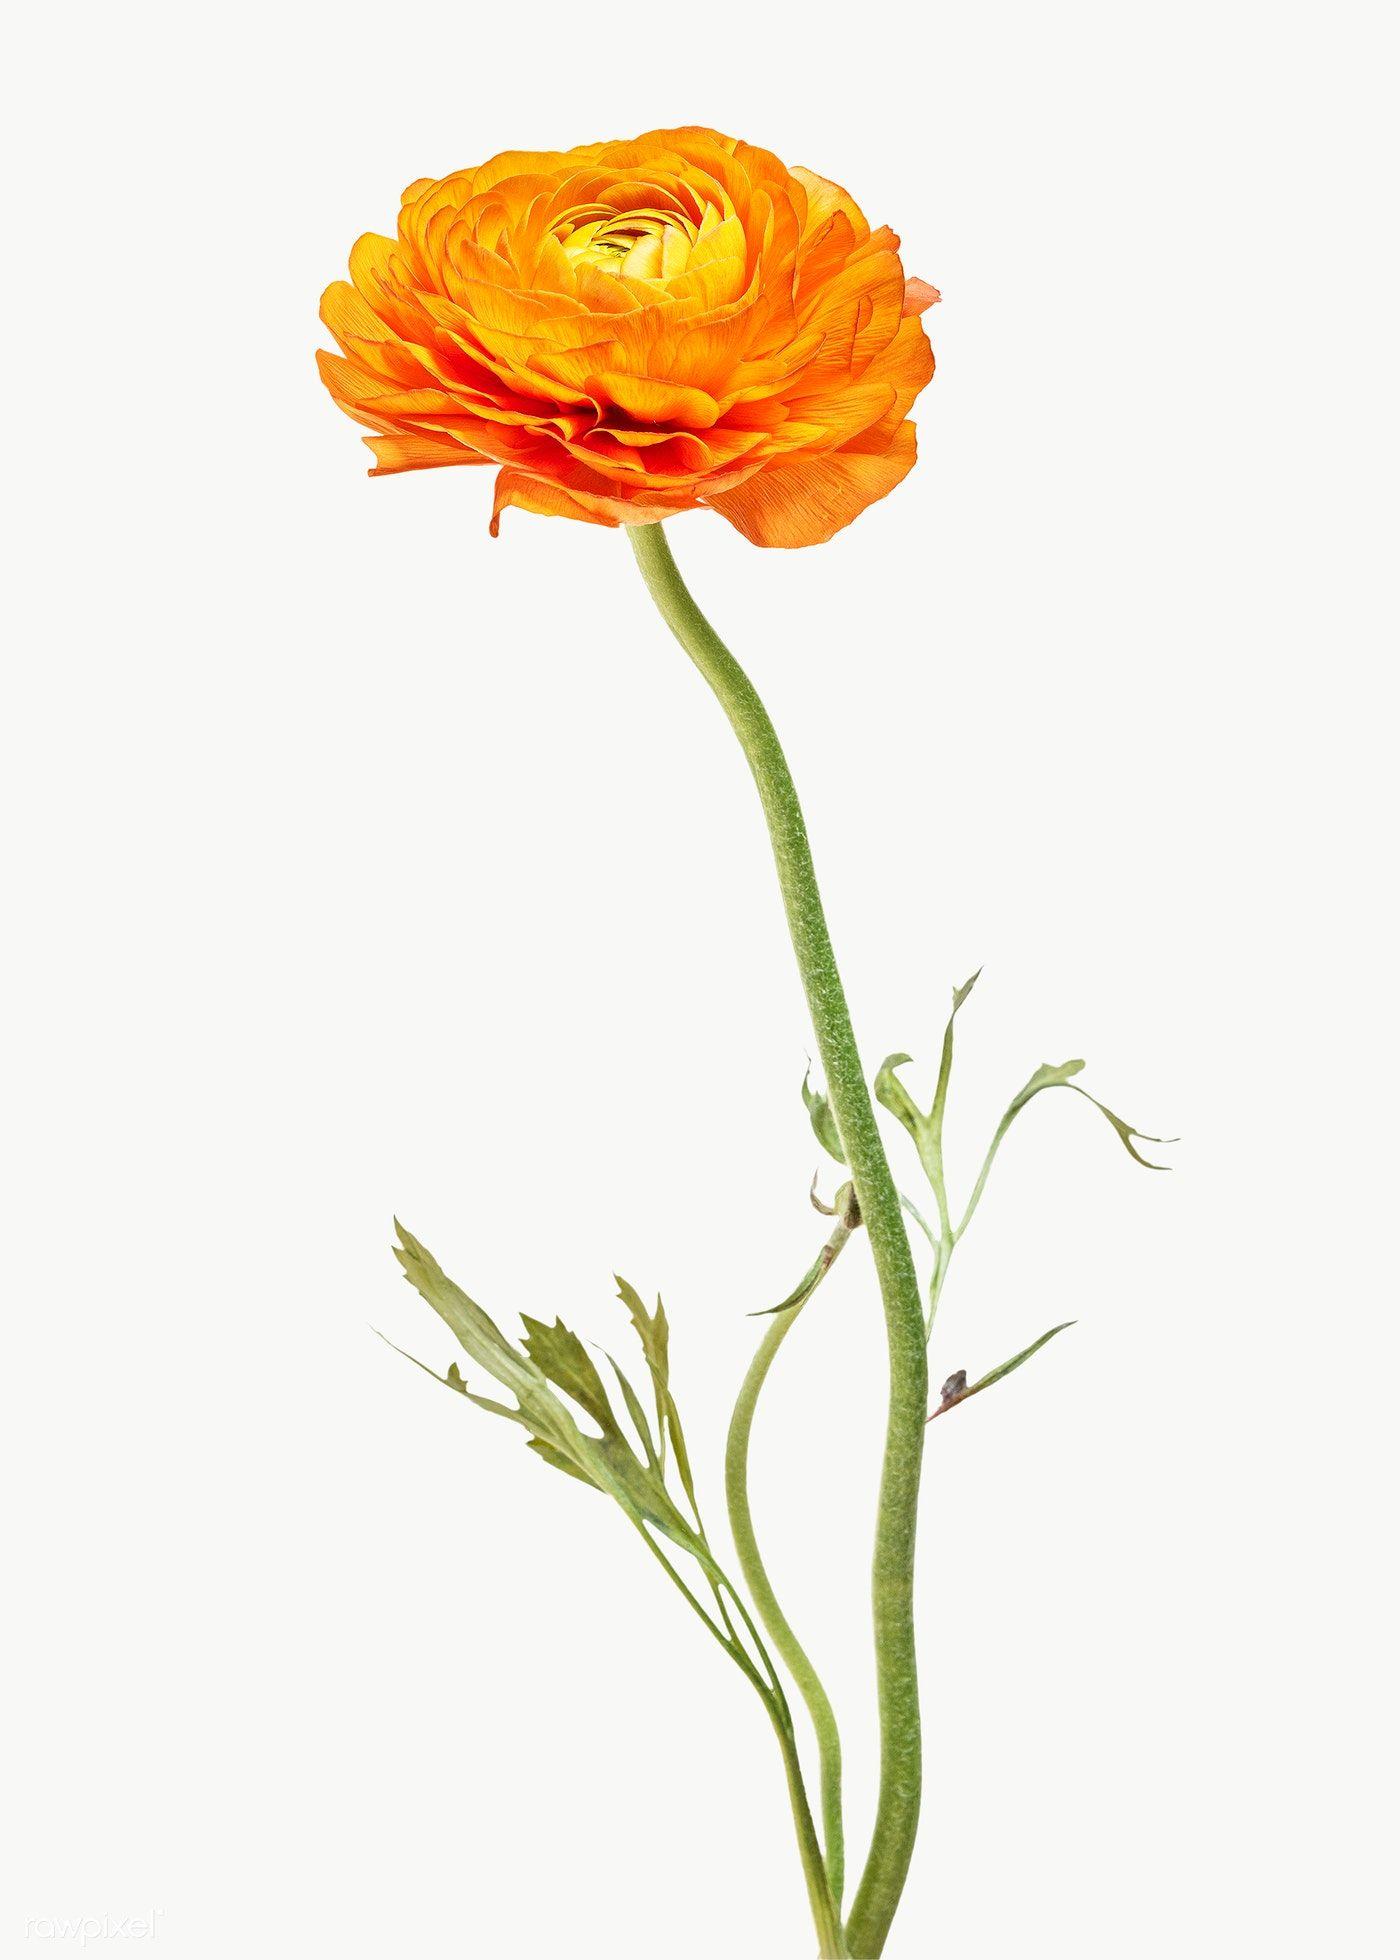 Bright Orange Ranunculus Flower Transparent Png Free Image By Rawpixel Com Teddy Rawpixel Macro Photography Flowers Orange Ranunculus White Lily Flower